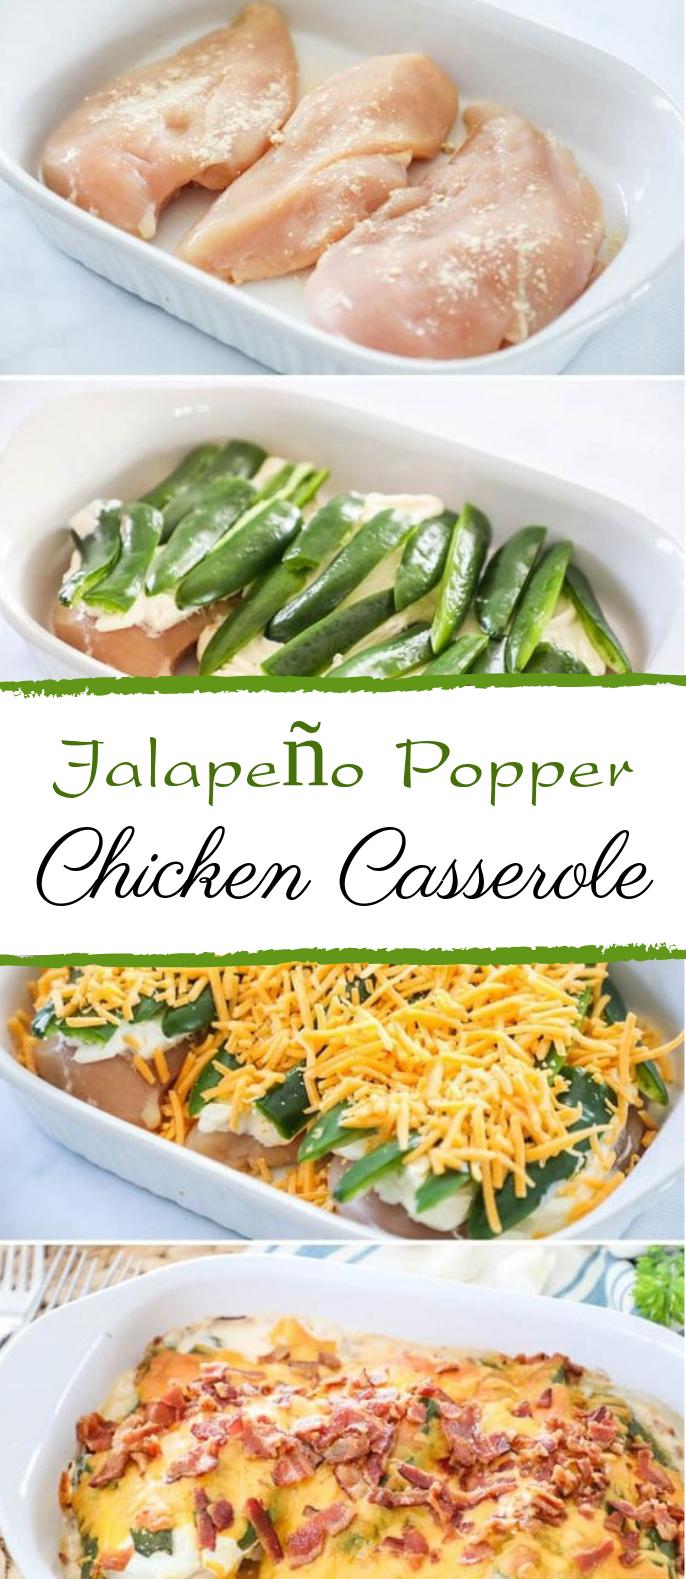 Jalapeño Popper Chicken Casserole #keto #lowcarb